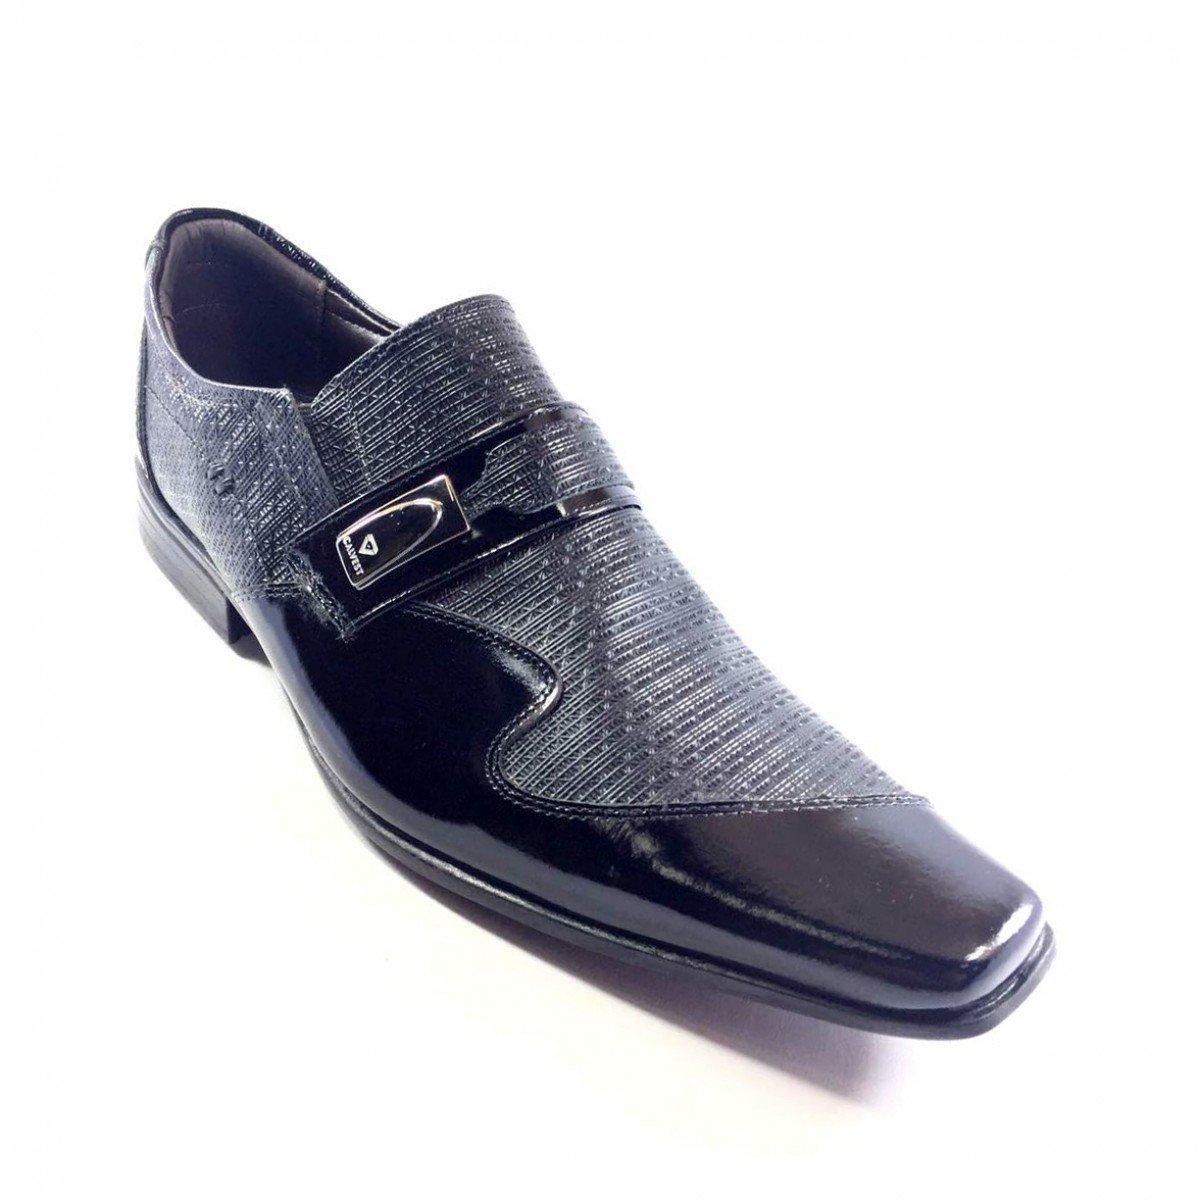 552cbd590eab3 Sapato Social Masculino Calvest Couro Preto - Compre Agora |Cabana ...